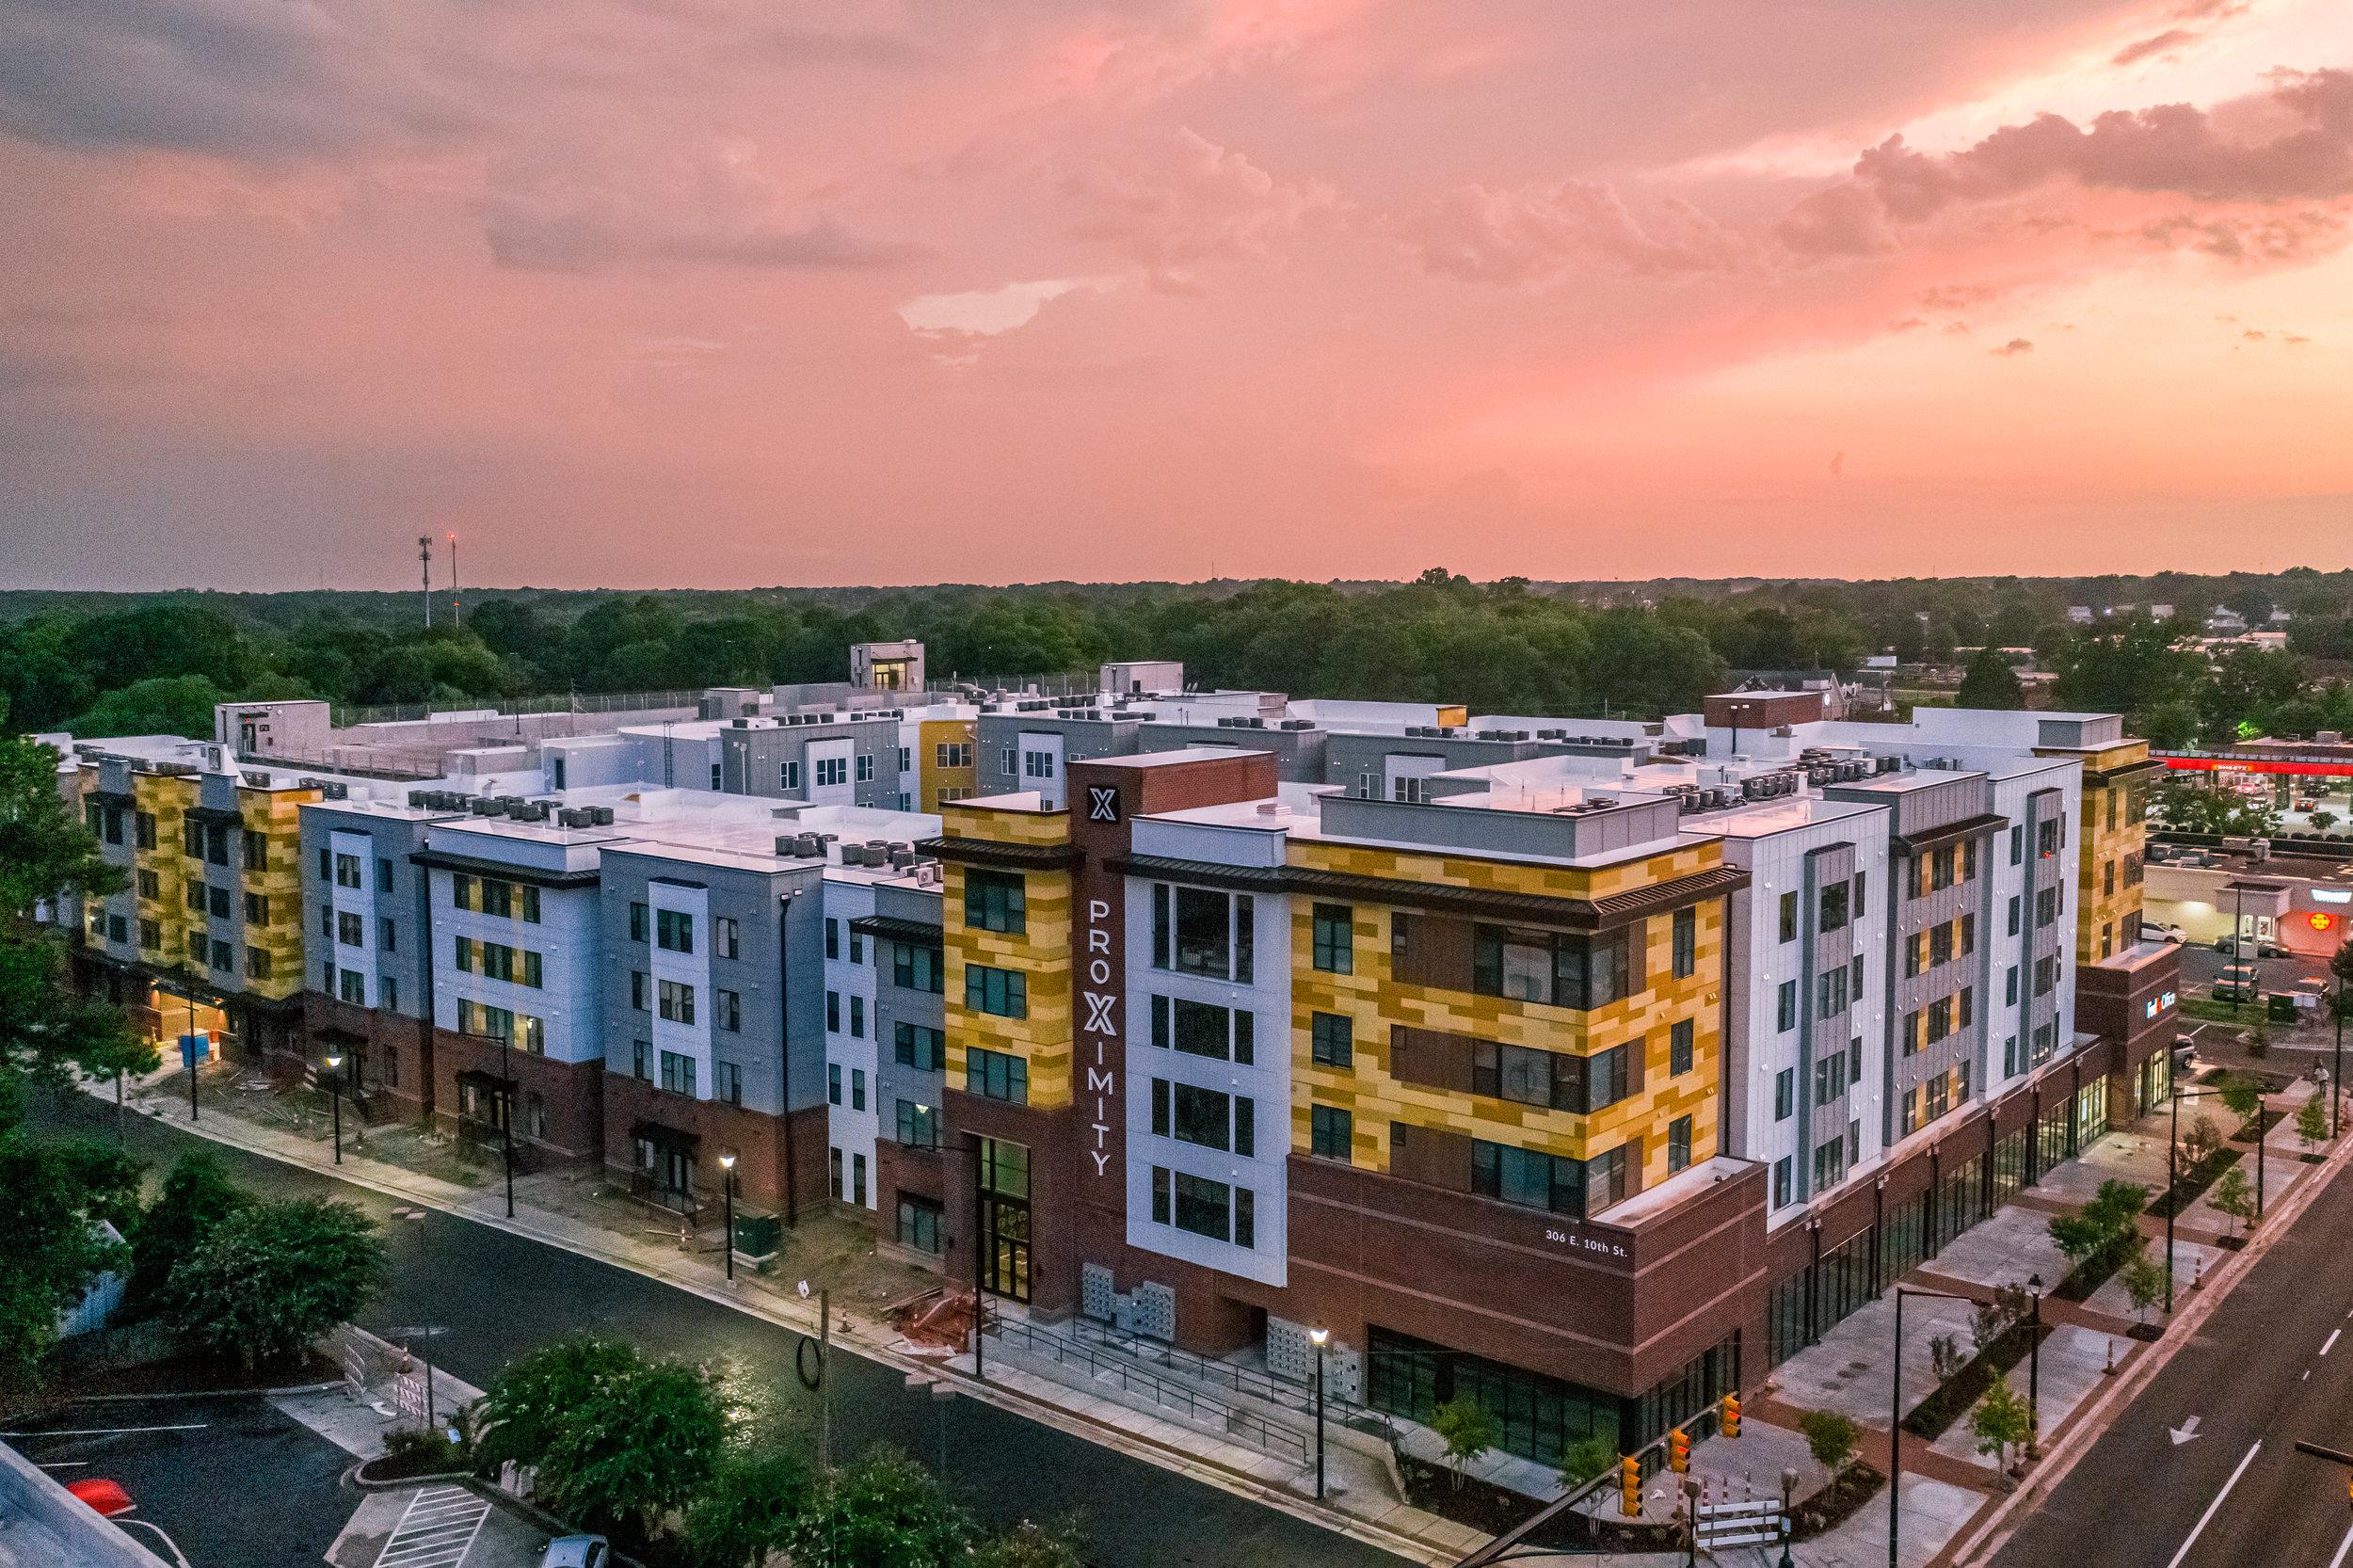 The_Proximity_10th_Street__Student_Housing_Taft_Development.jpg